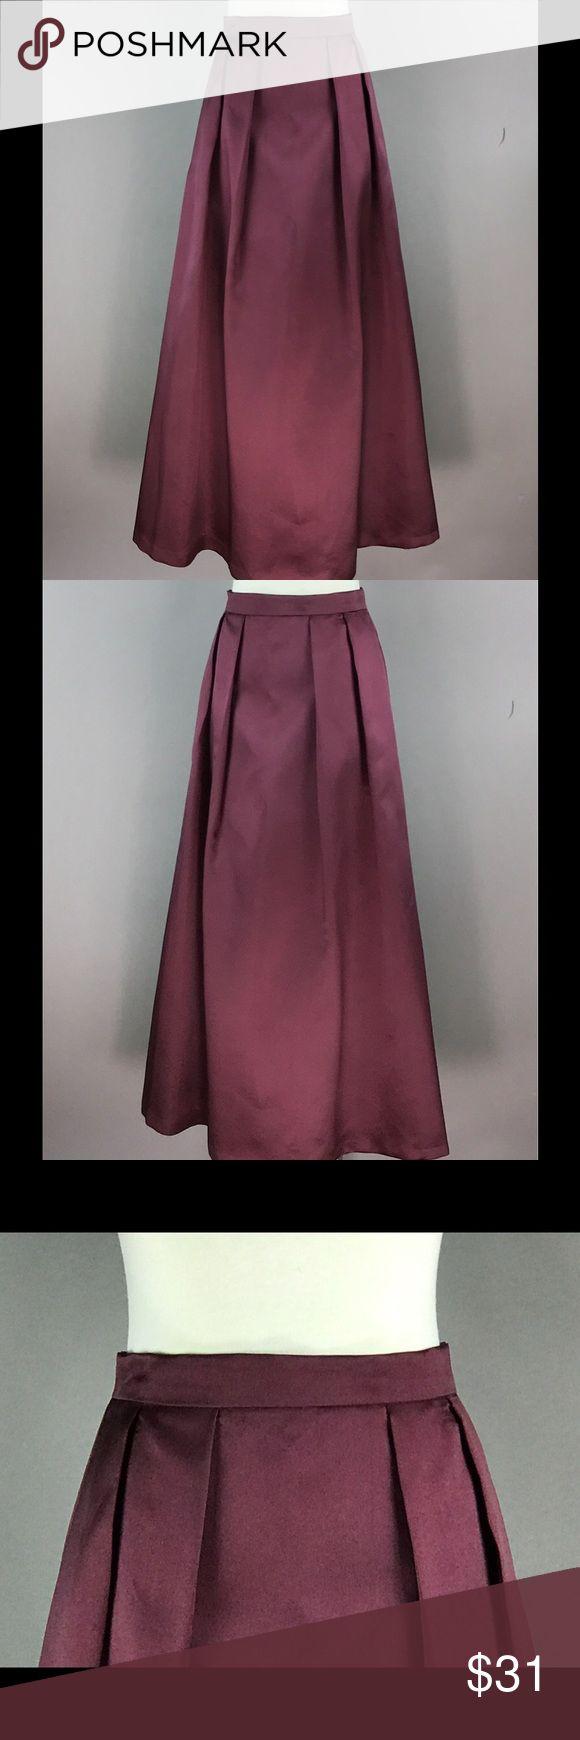 XSCAPE Red Burgundy Maxi Skirt Line Metallic NEW XSCAPE Red Burgundy Ball Maxi Skirt Size 8 A Line Metallic Glossy Pleated Back Zip Lined NEW Xscape Skirts Maxi